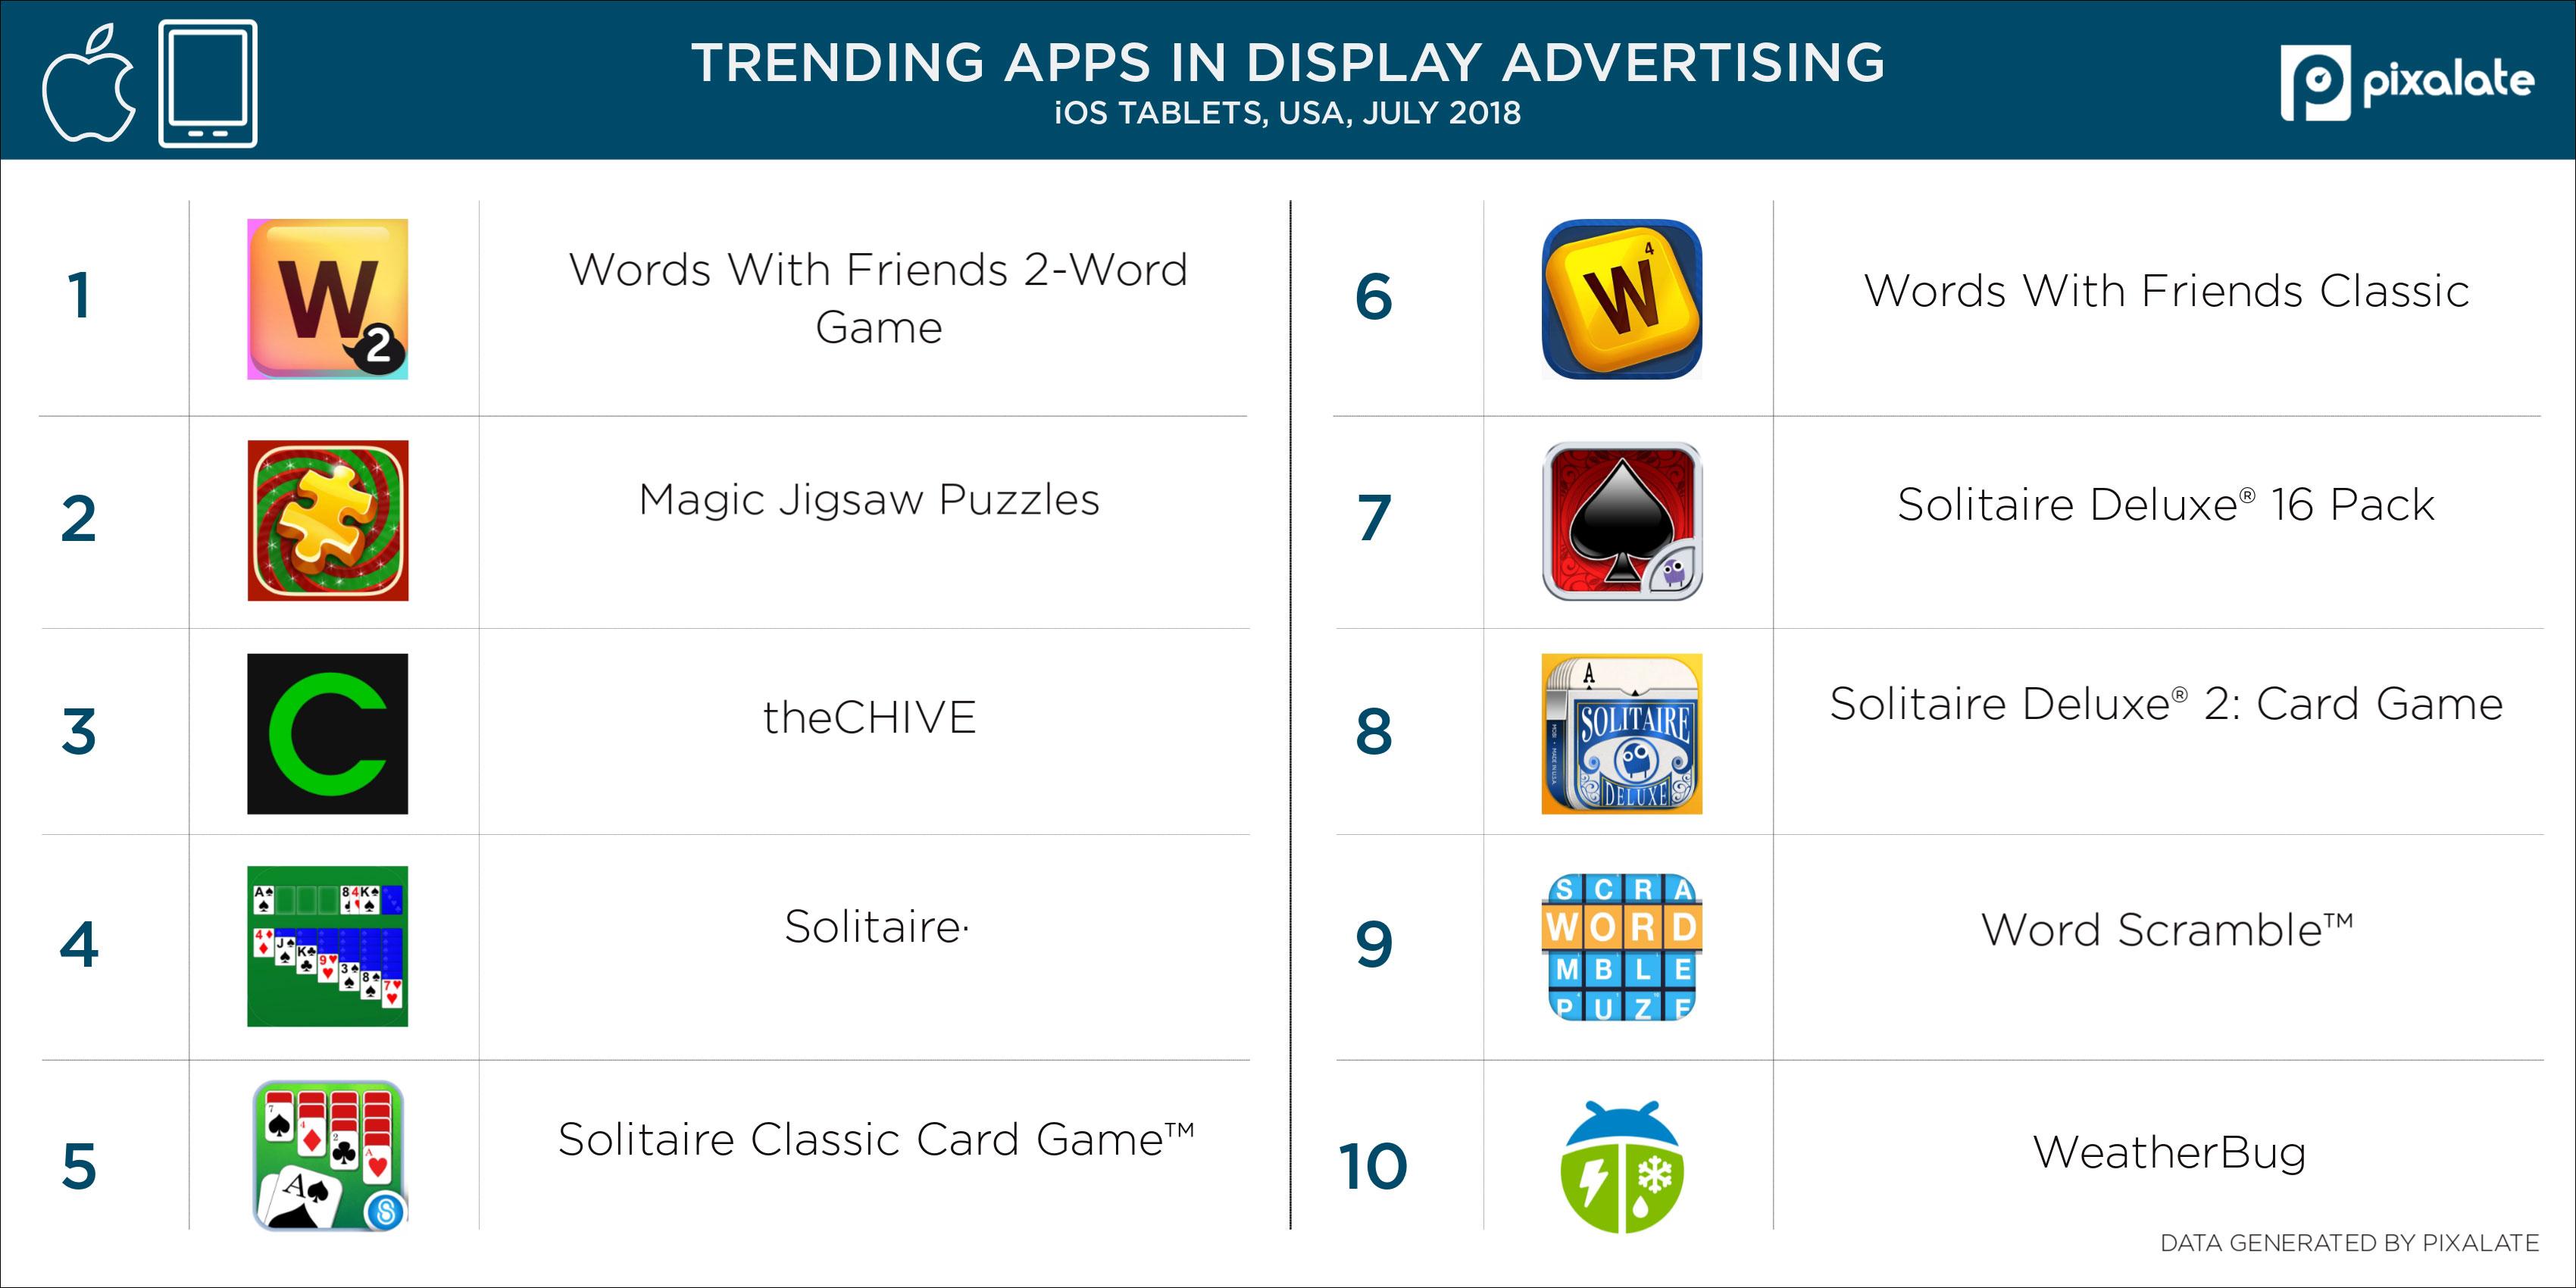 Display-iPad-tablet-top-apps-USA-(July-2018-data)